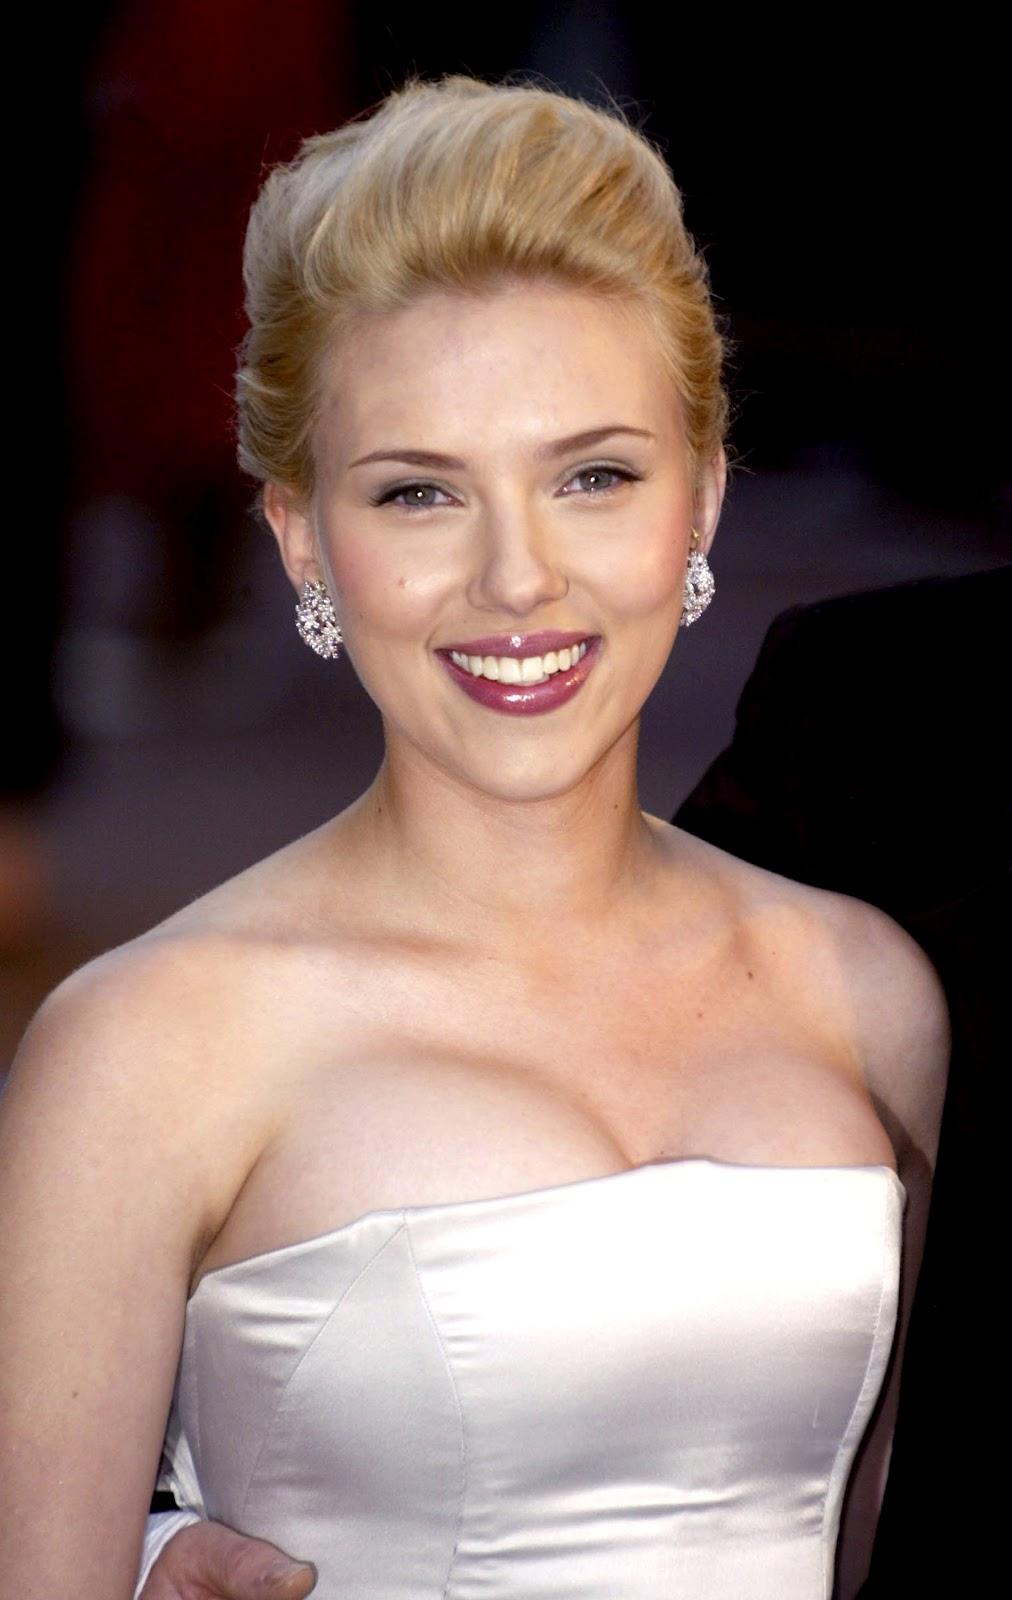 Scarlett johansson pictures gallery 41 film actresses - Scarlett johansson blogspot ...